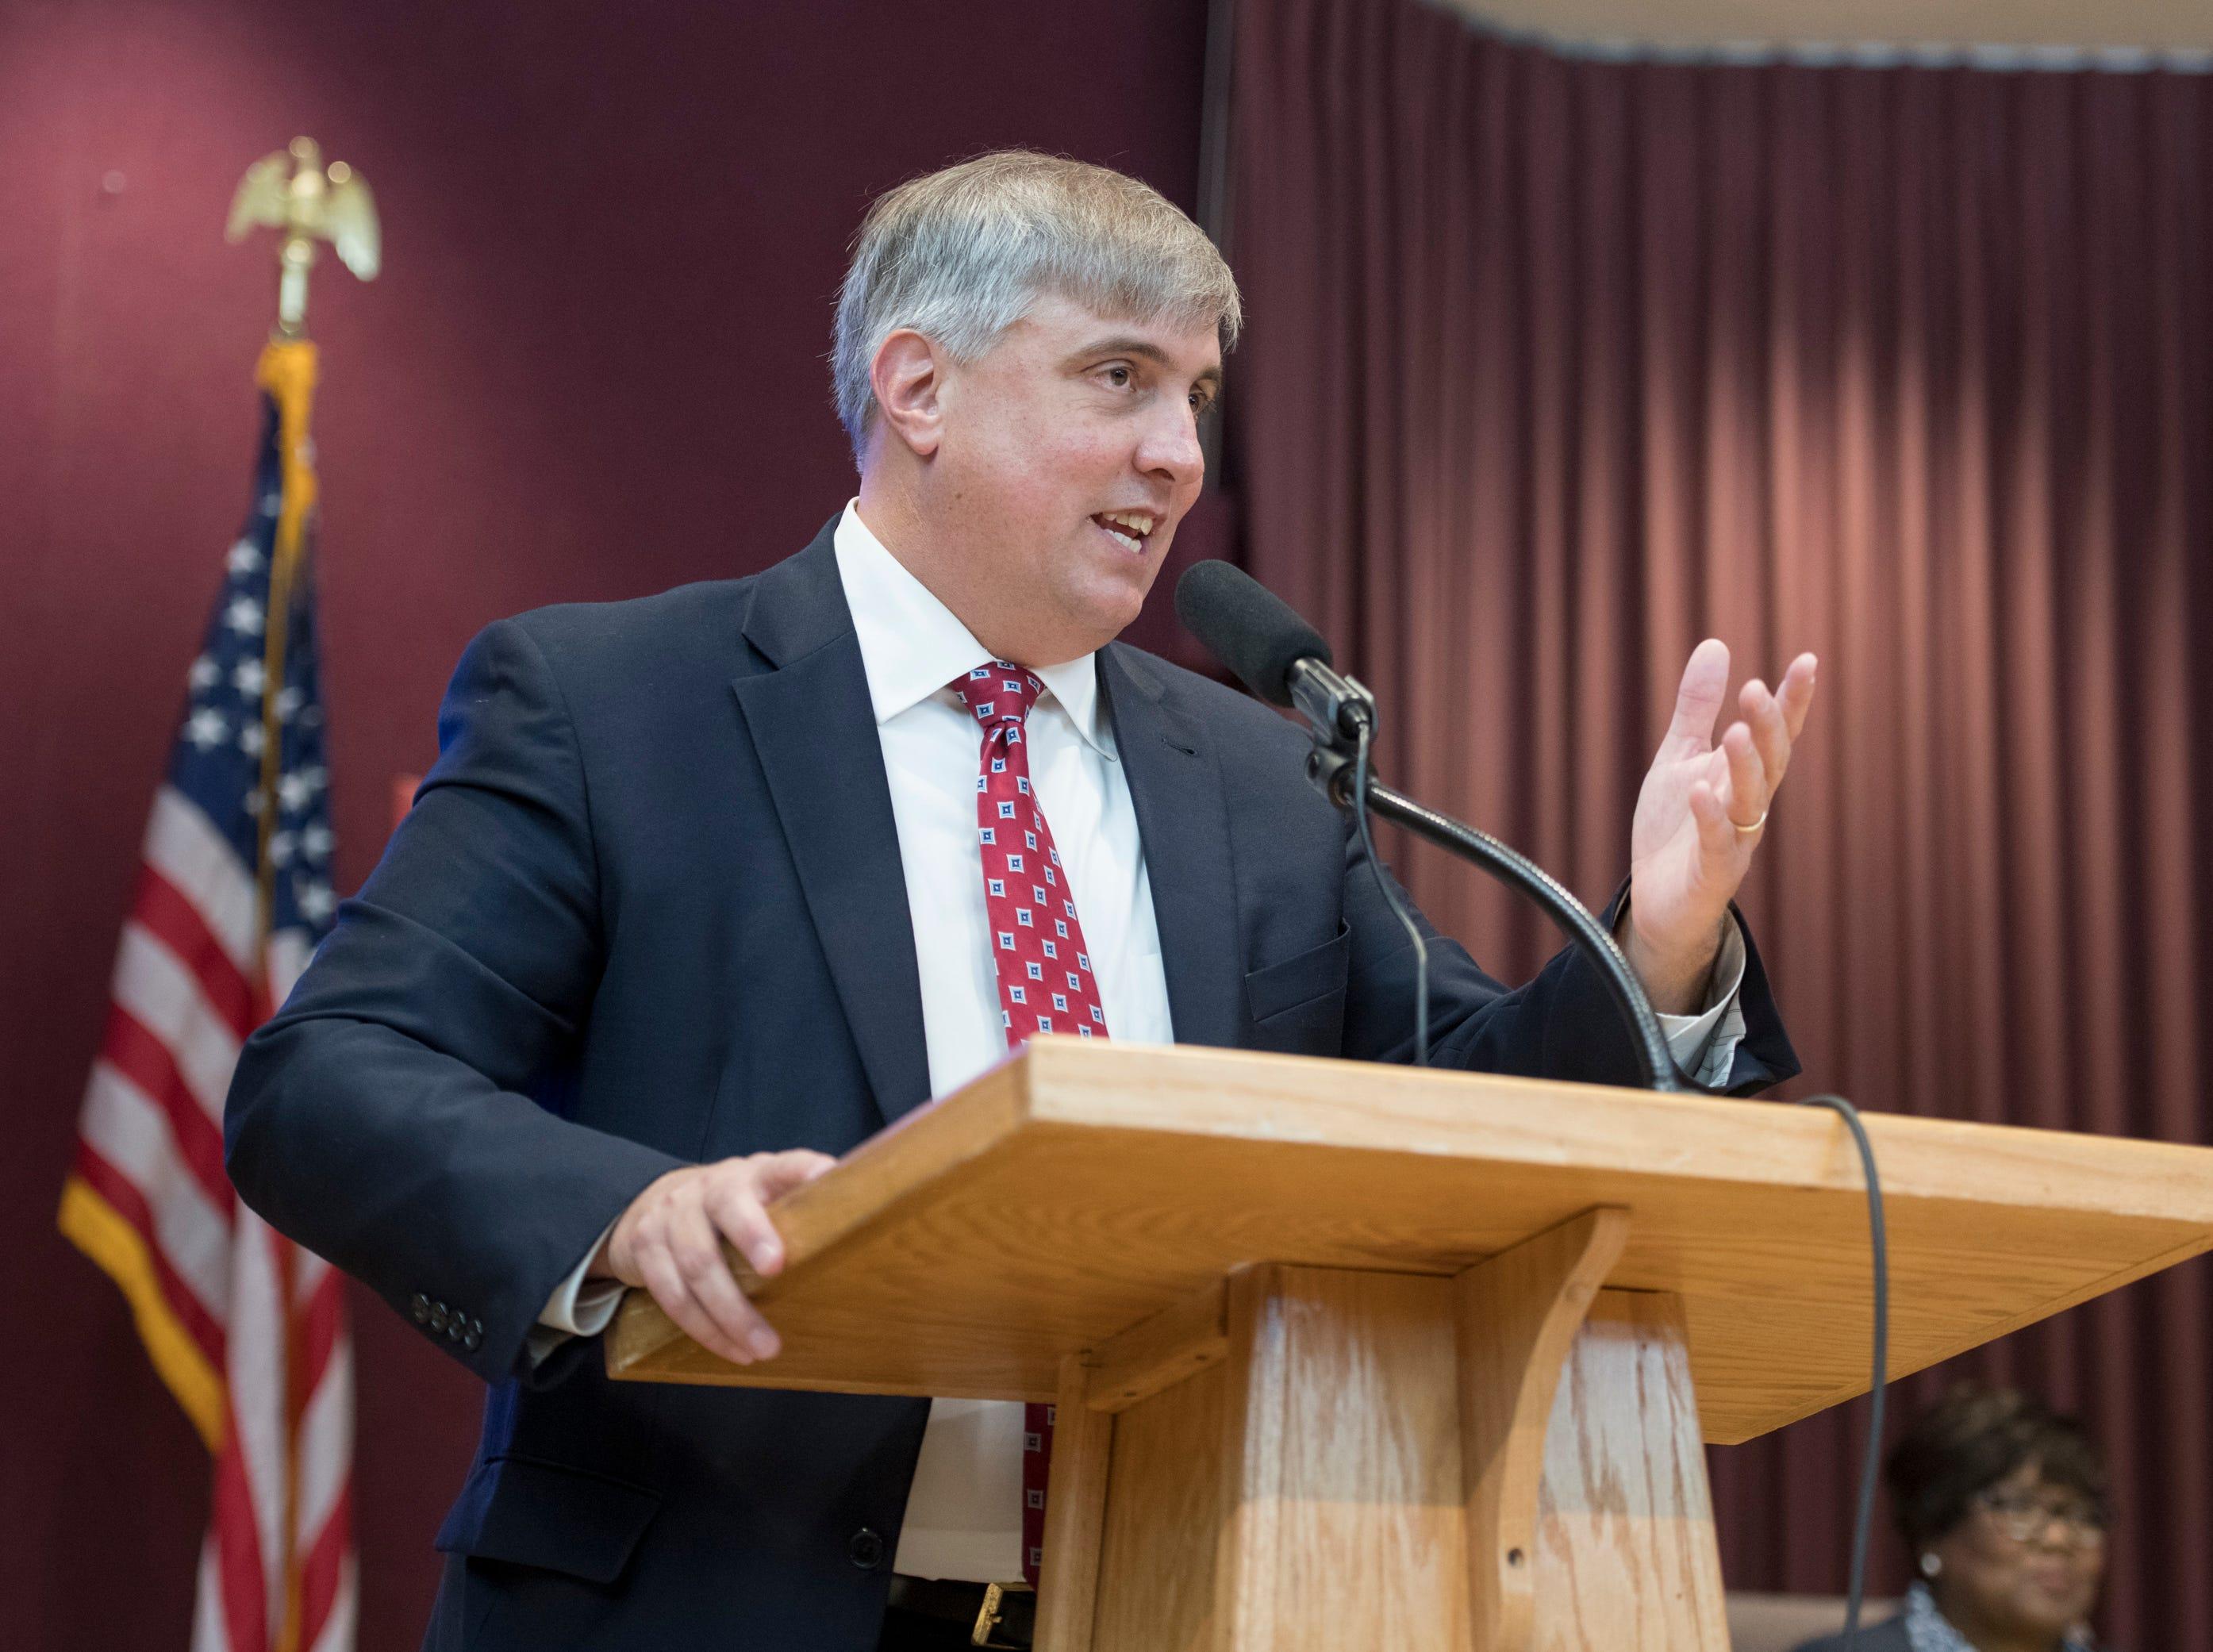 Editorial: New mayor inherits challenges, opportunities